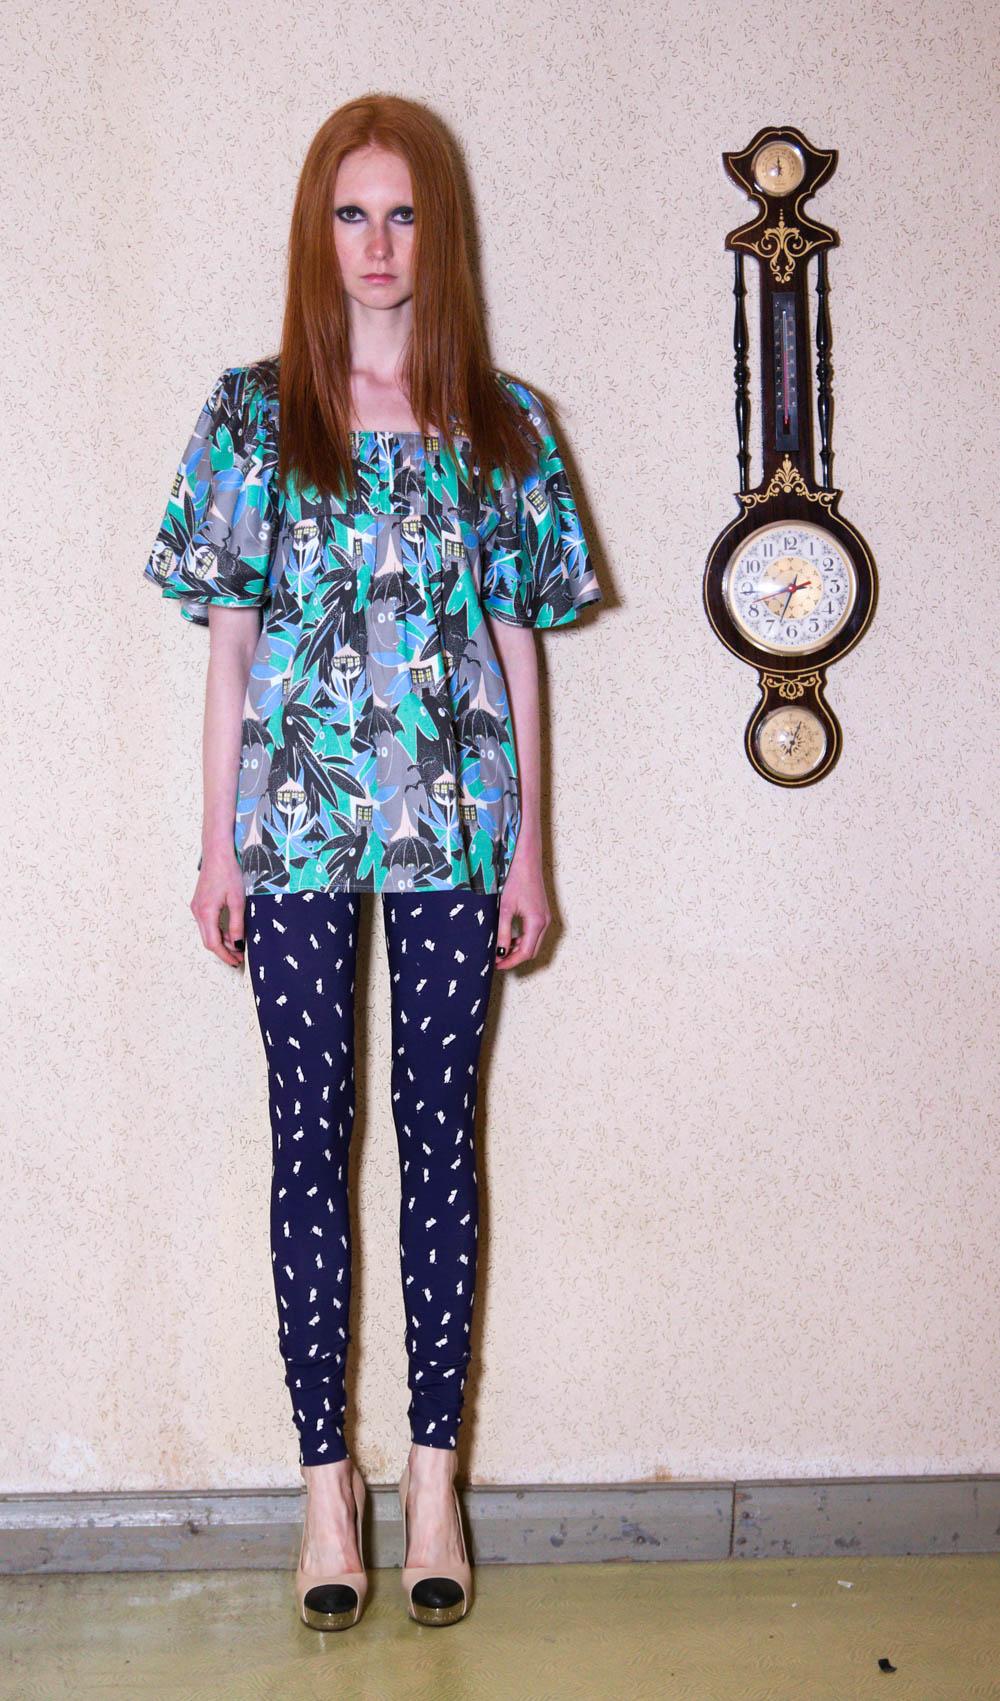 Ivana Helsinki Moomin Leggings